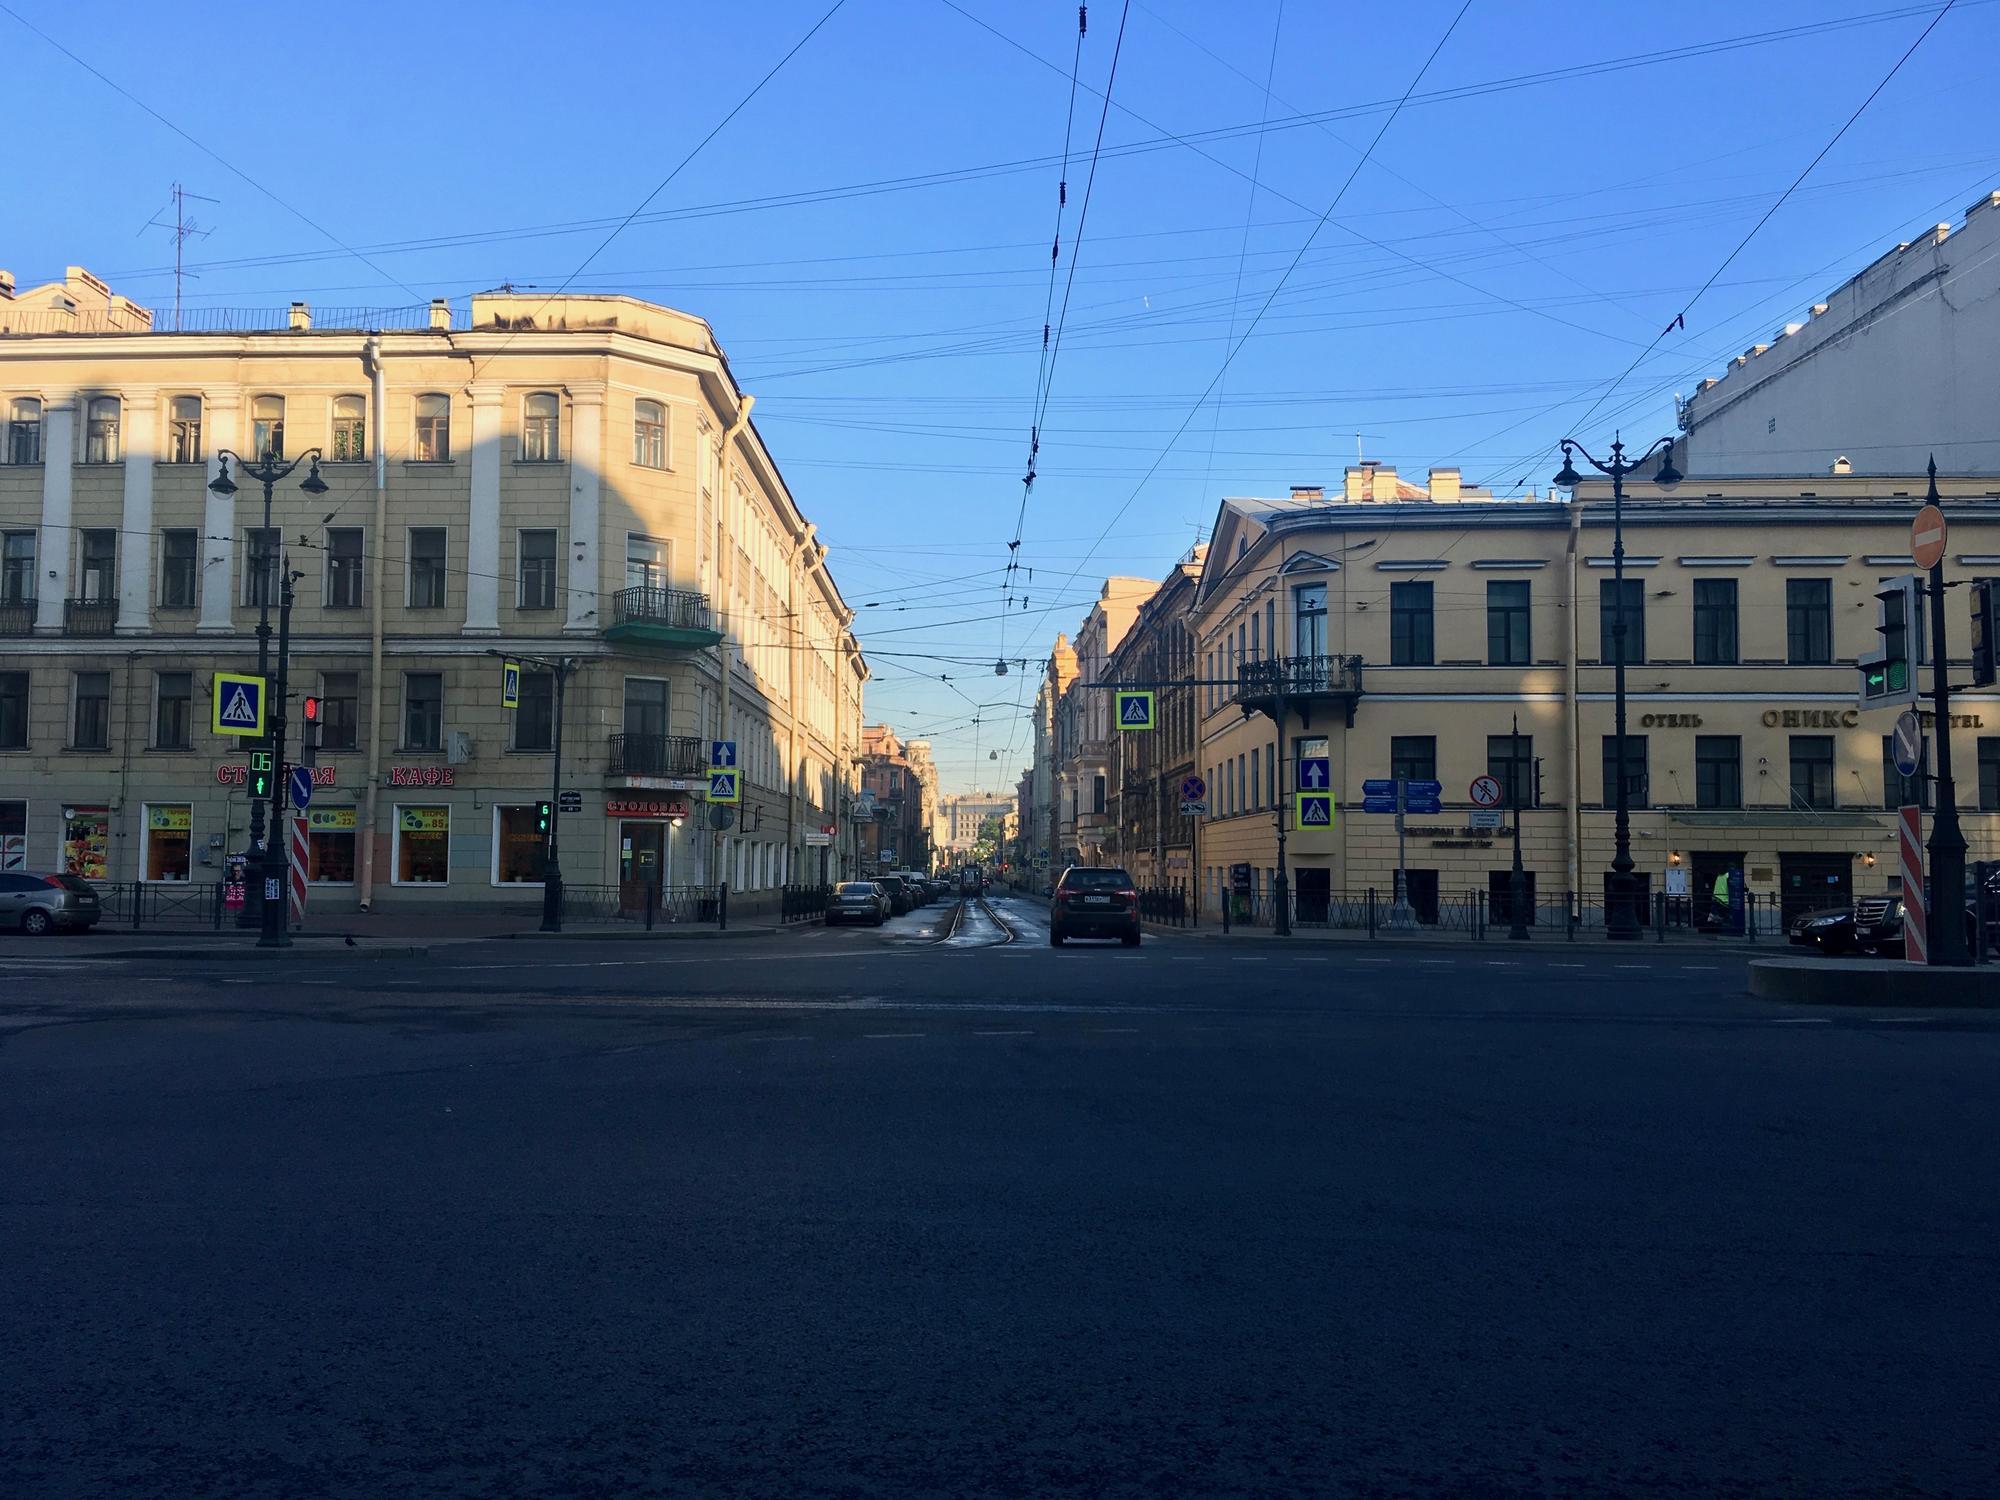 🇷🇺 Санкт-Петербург, Россия, май 2018.